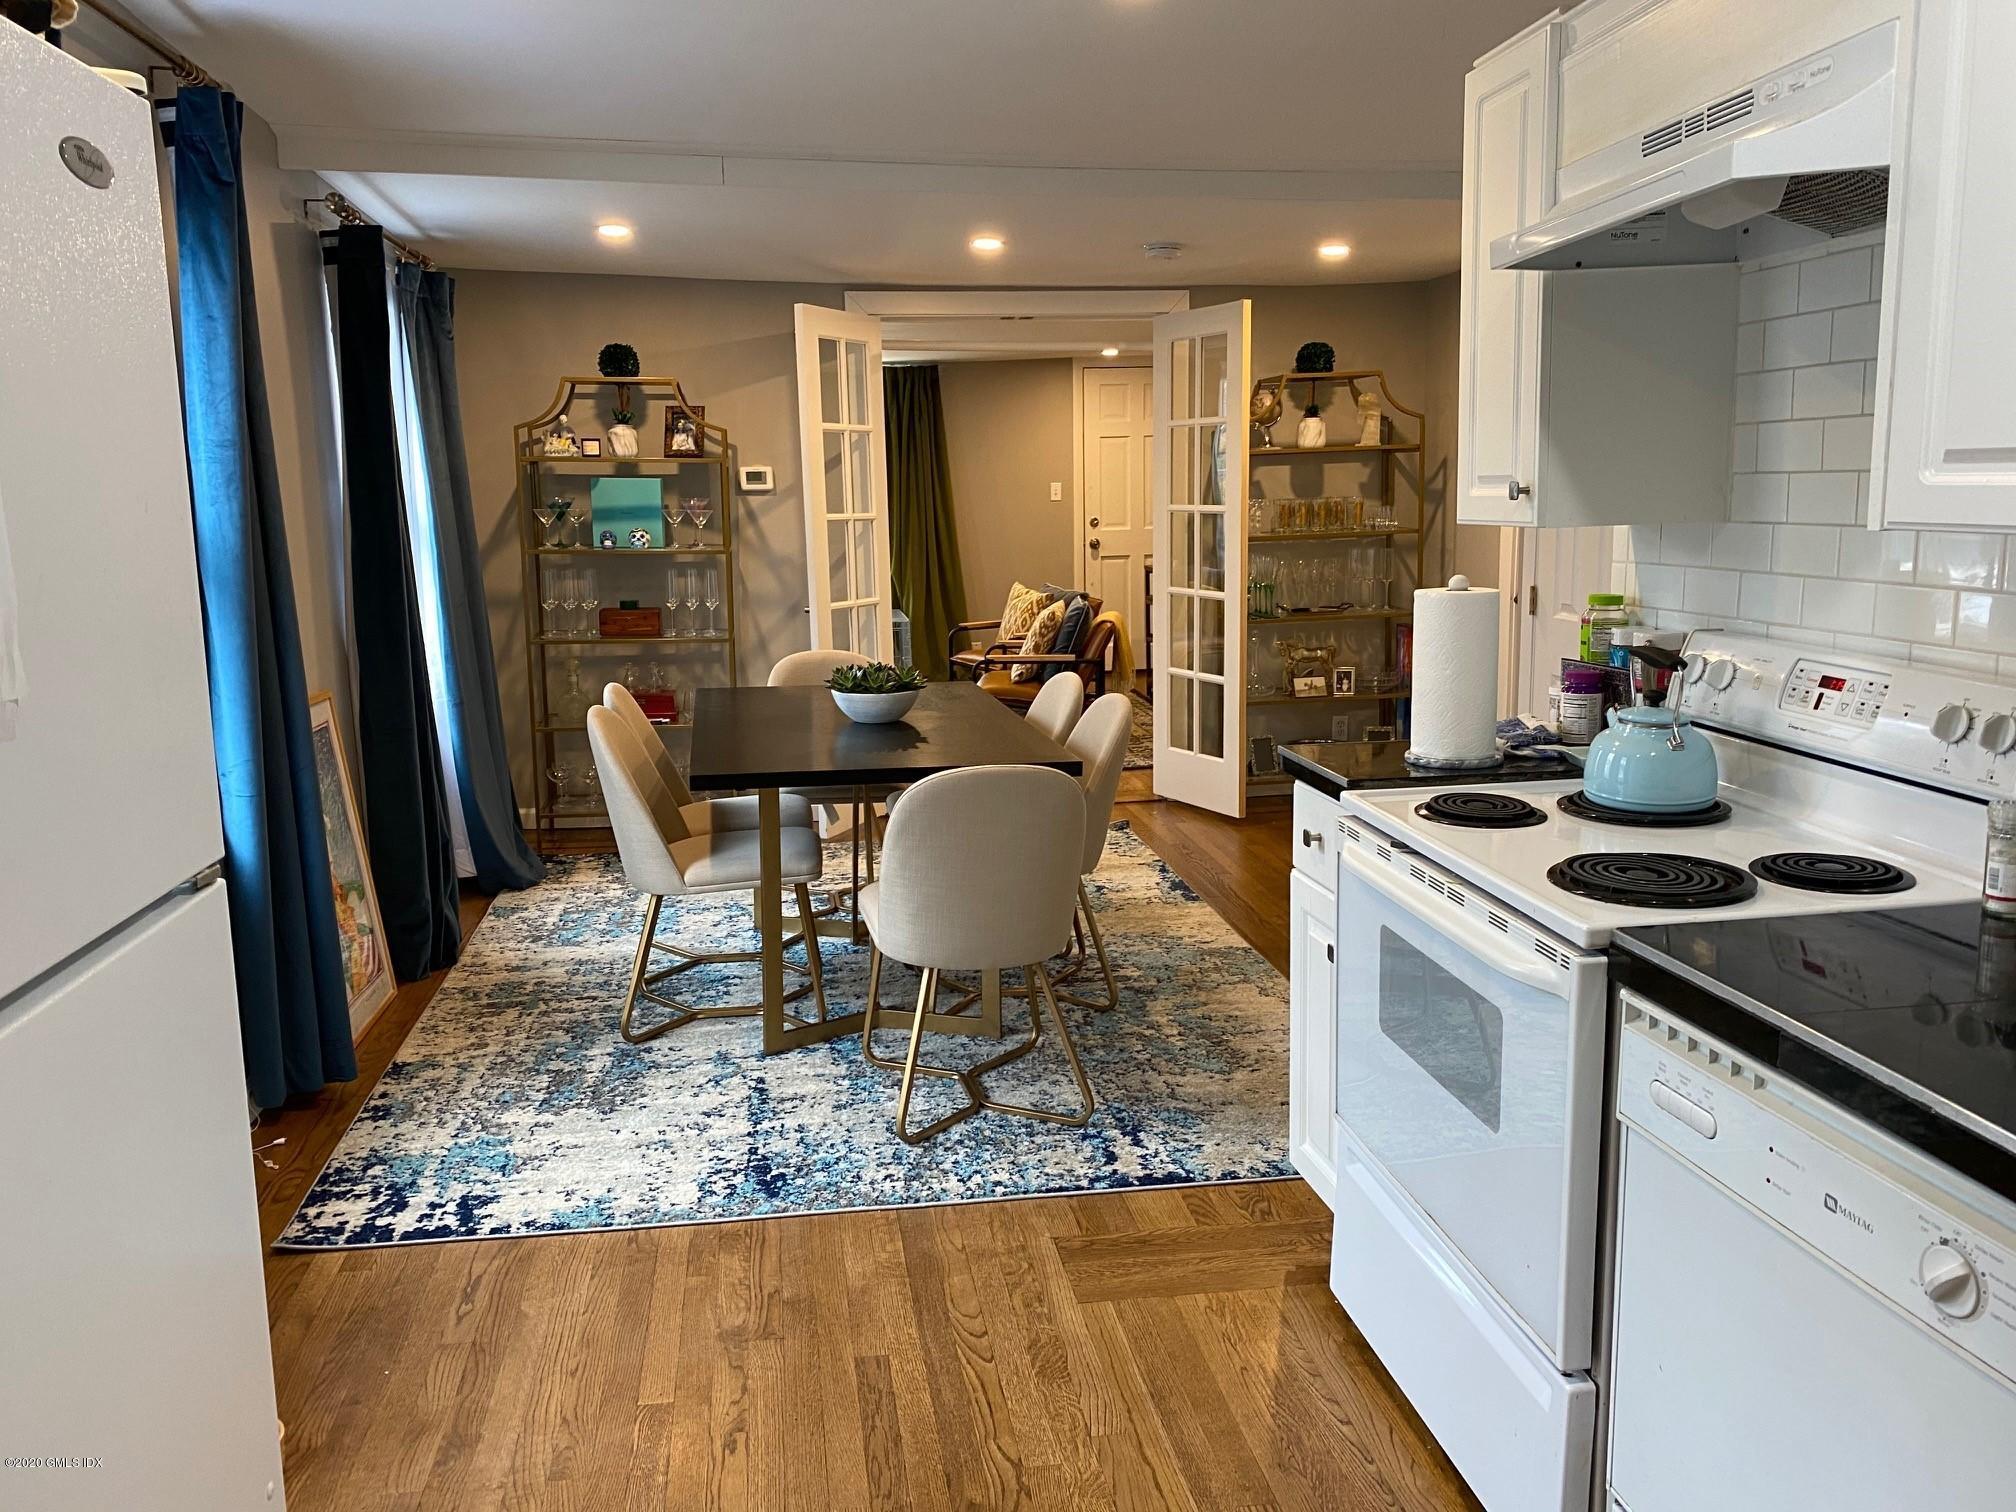 28 Bruce Park Avenue,Greenwich,Connecticut 06830,2 Bedrooms Bedrooms,2 BathroomsBathrooms,Apartment,Bruce Park,108940